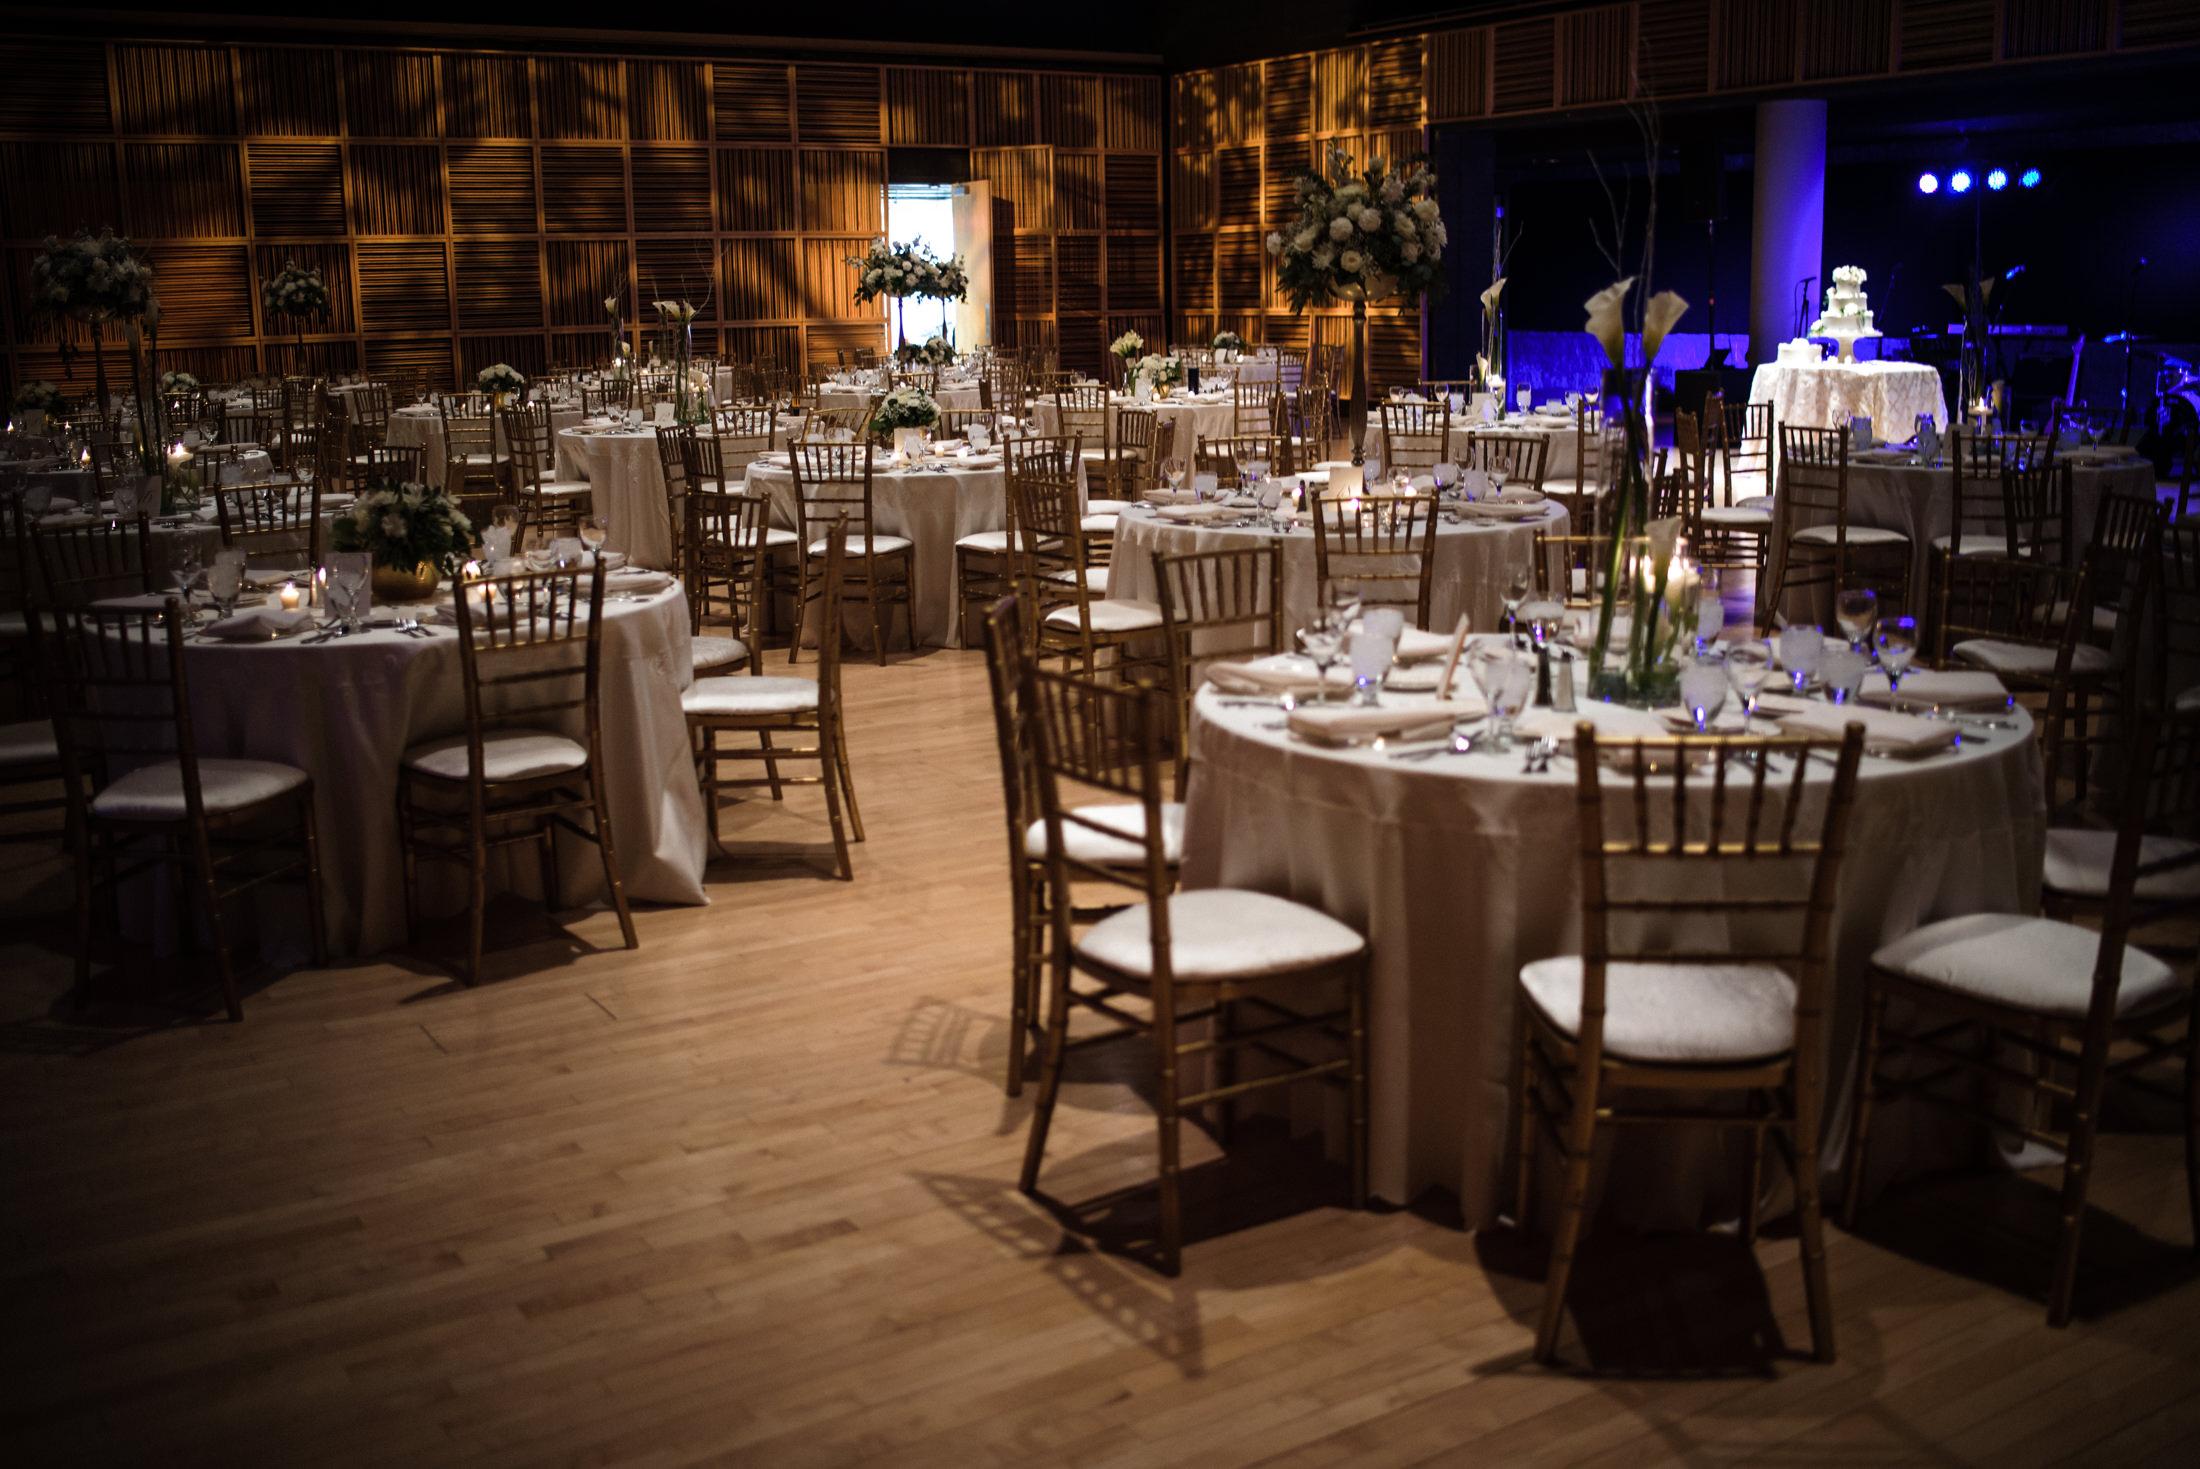 holland-center-reception-omaha-wedding-photographer-0005.JPG